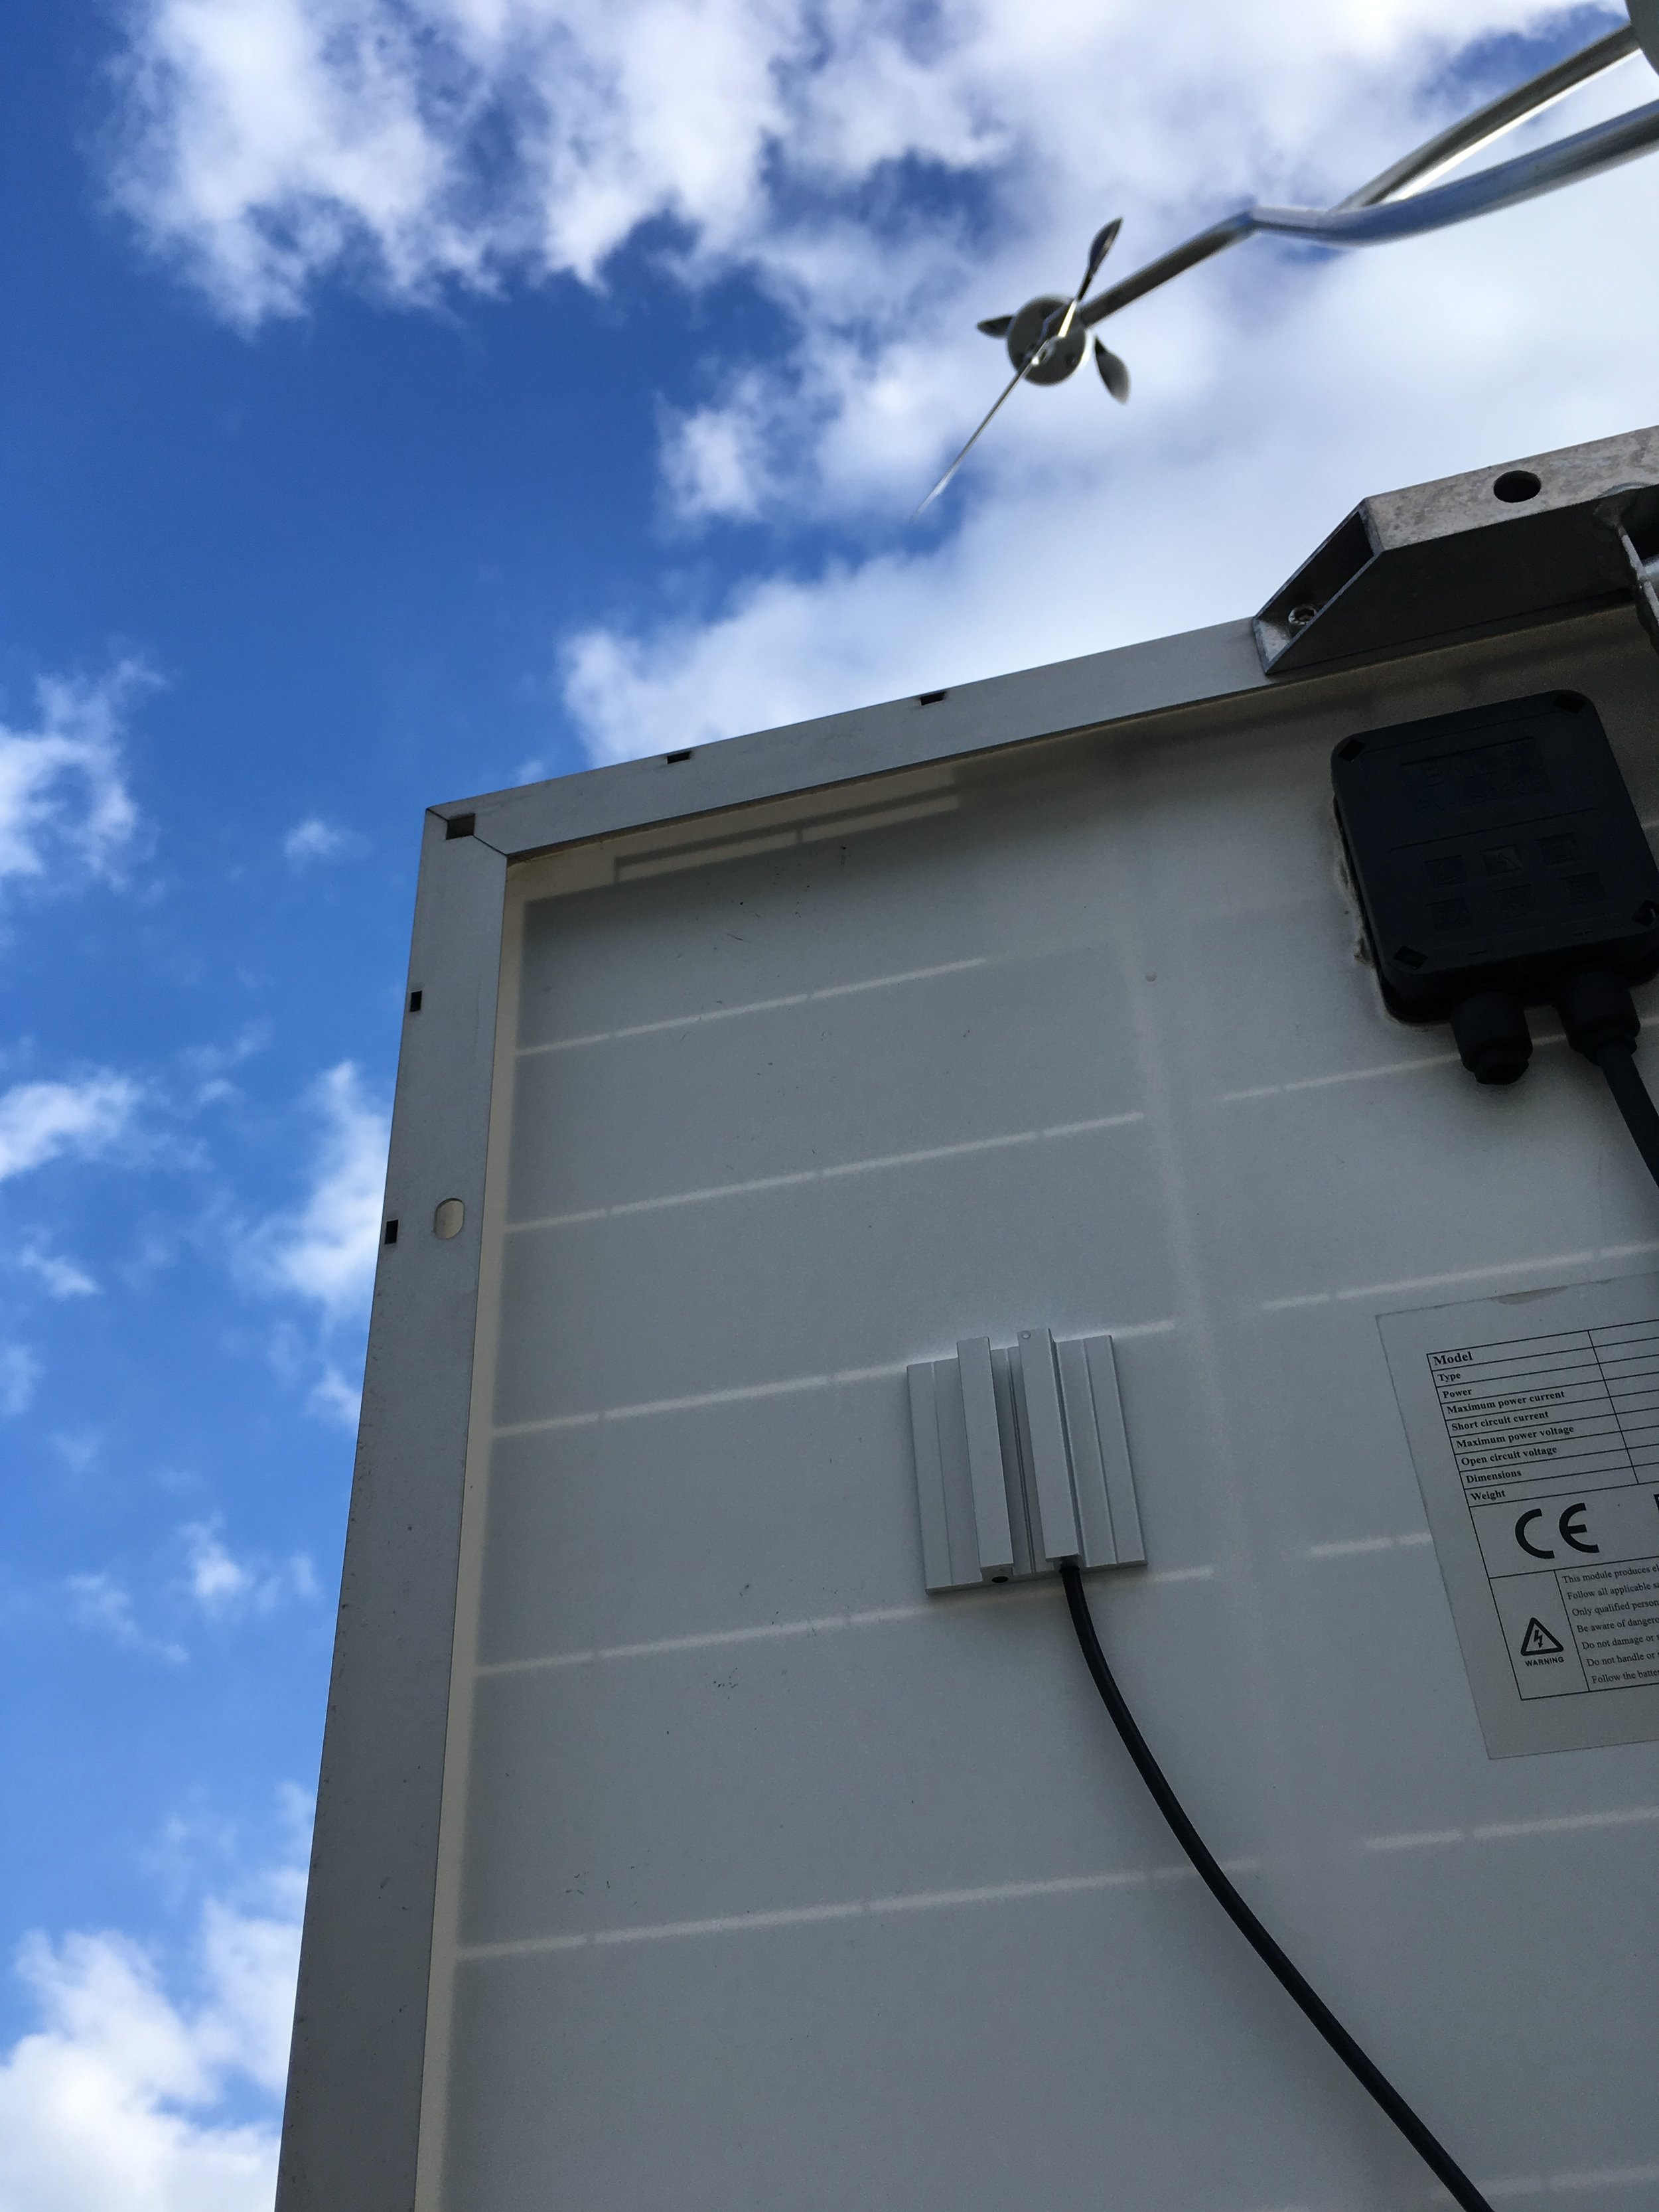 SolarTemp PT100 on a solar panel